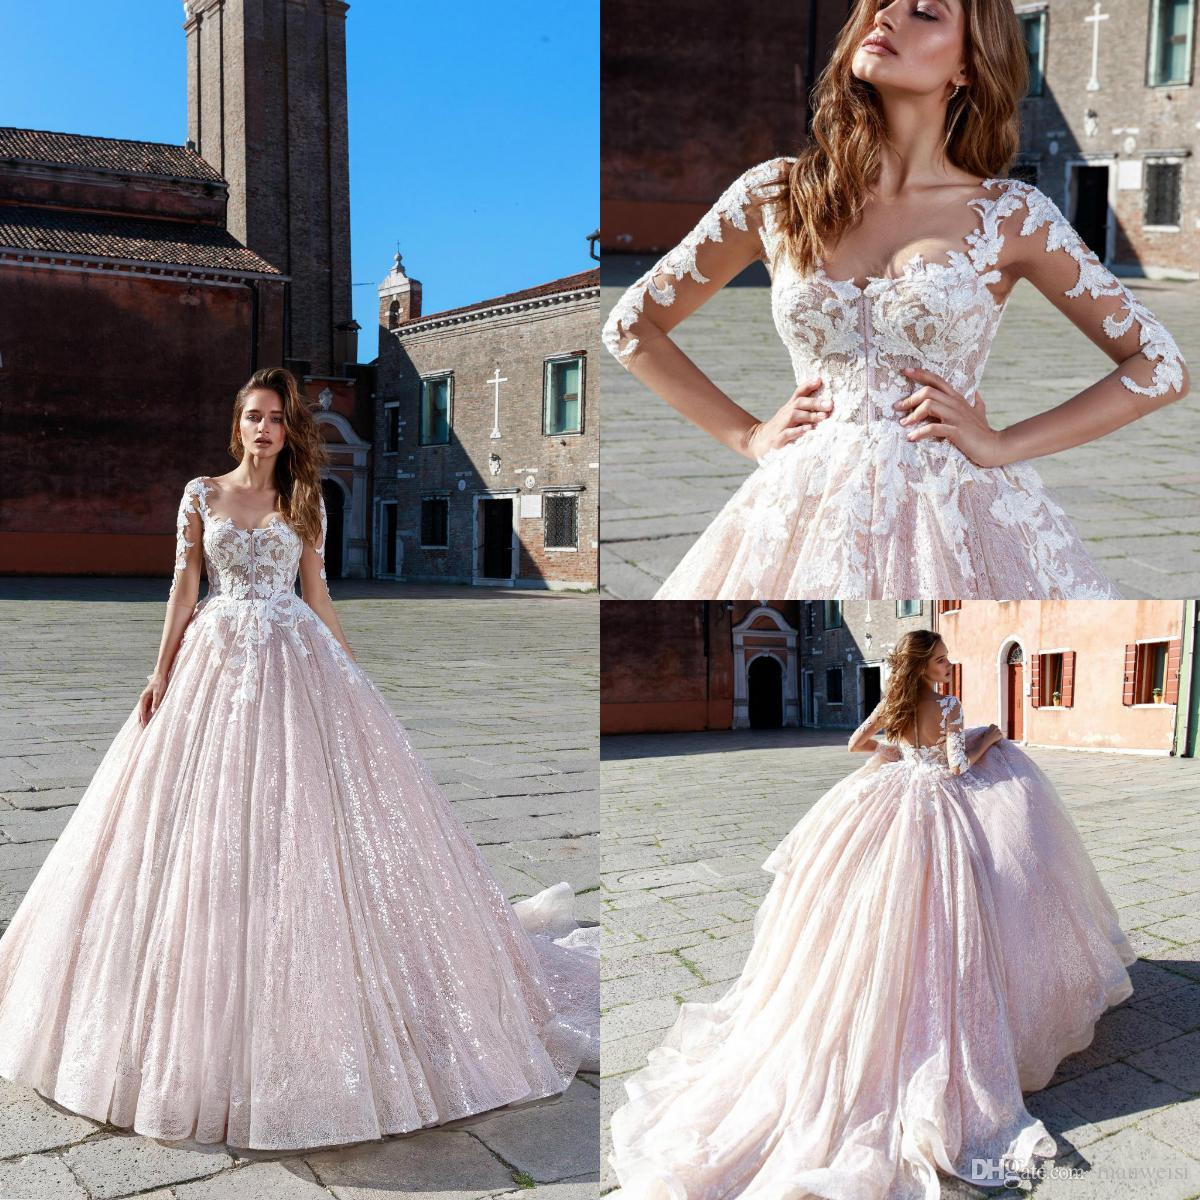 087f0f81ff4c Ricca Sposa Blush Ball Gown Wedding Dresses 2019 New 3/4 Long Sleeves Beads  Appliques Bridal Gowns Dubai Sequined Vestidos De Novia Maternity Wedding  Dress ...